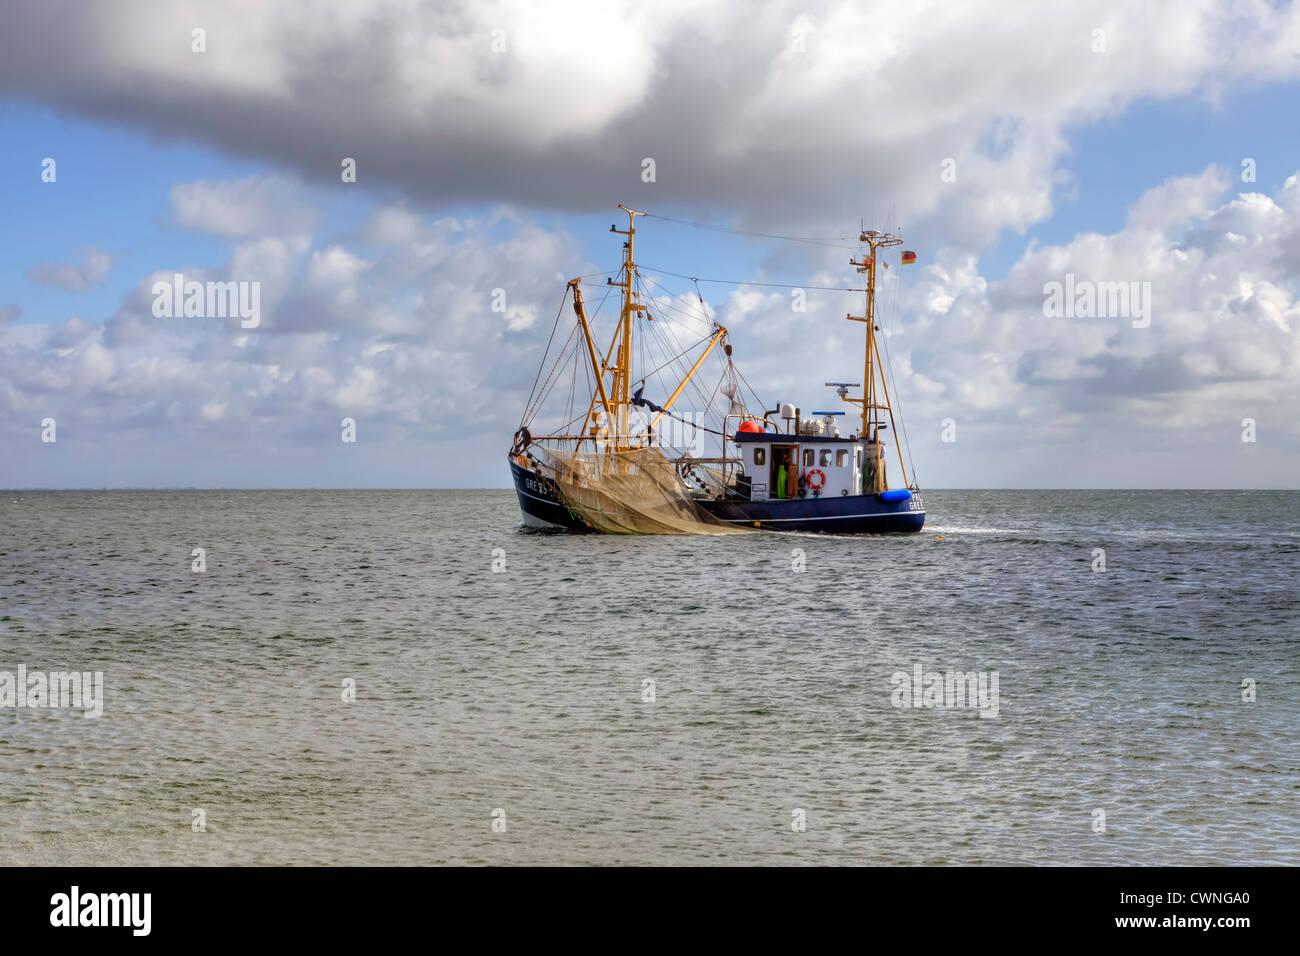 Trawler, Sylt, North Sea, Hornum, Schleswig-Holstein, Germany Stock Photo